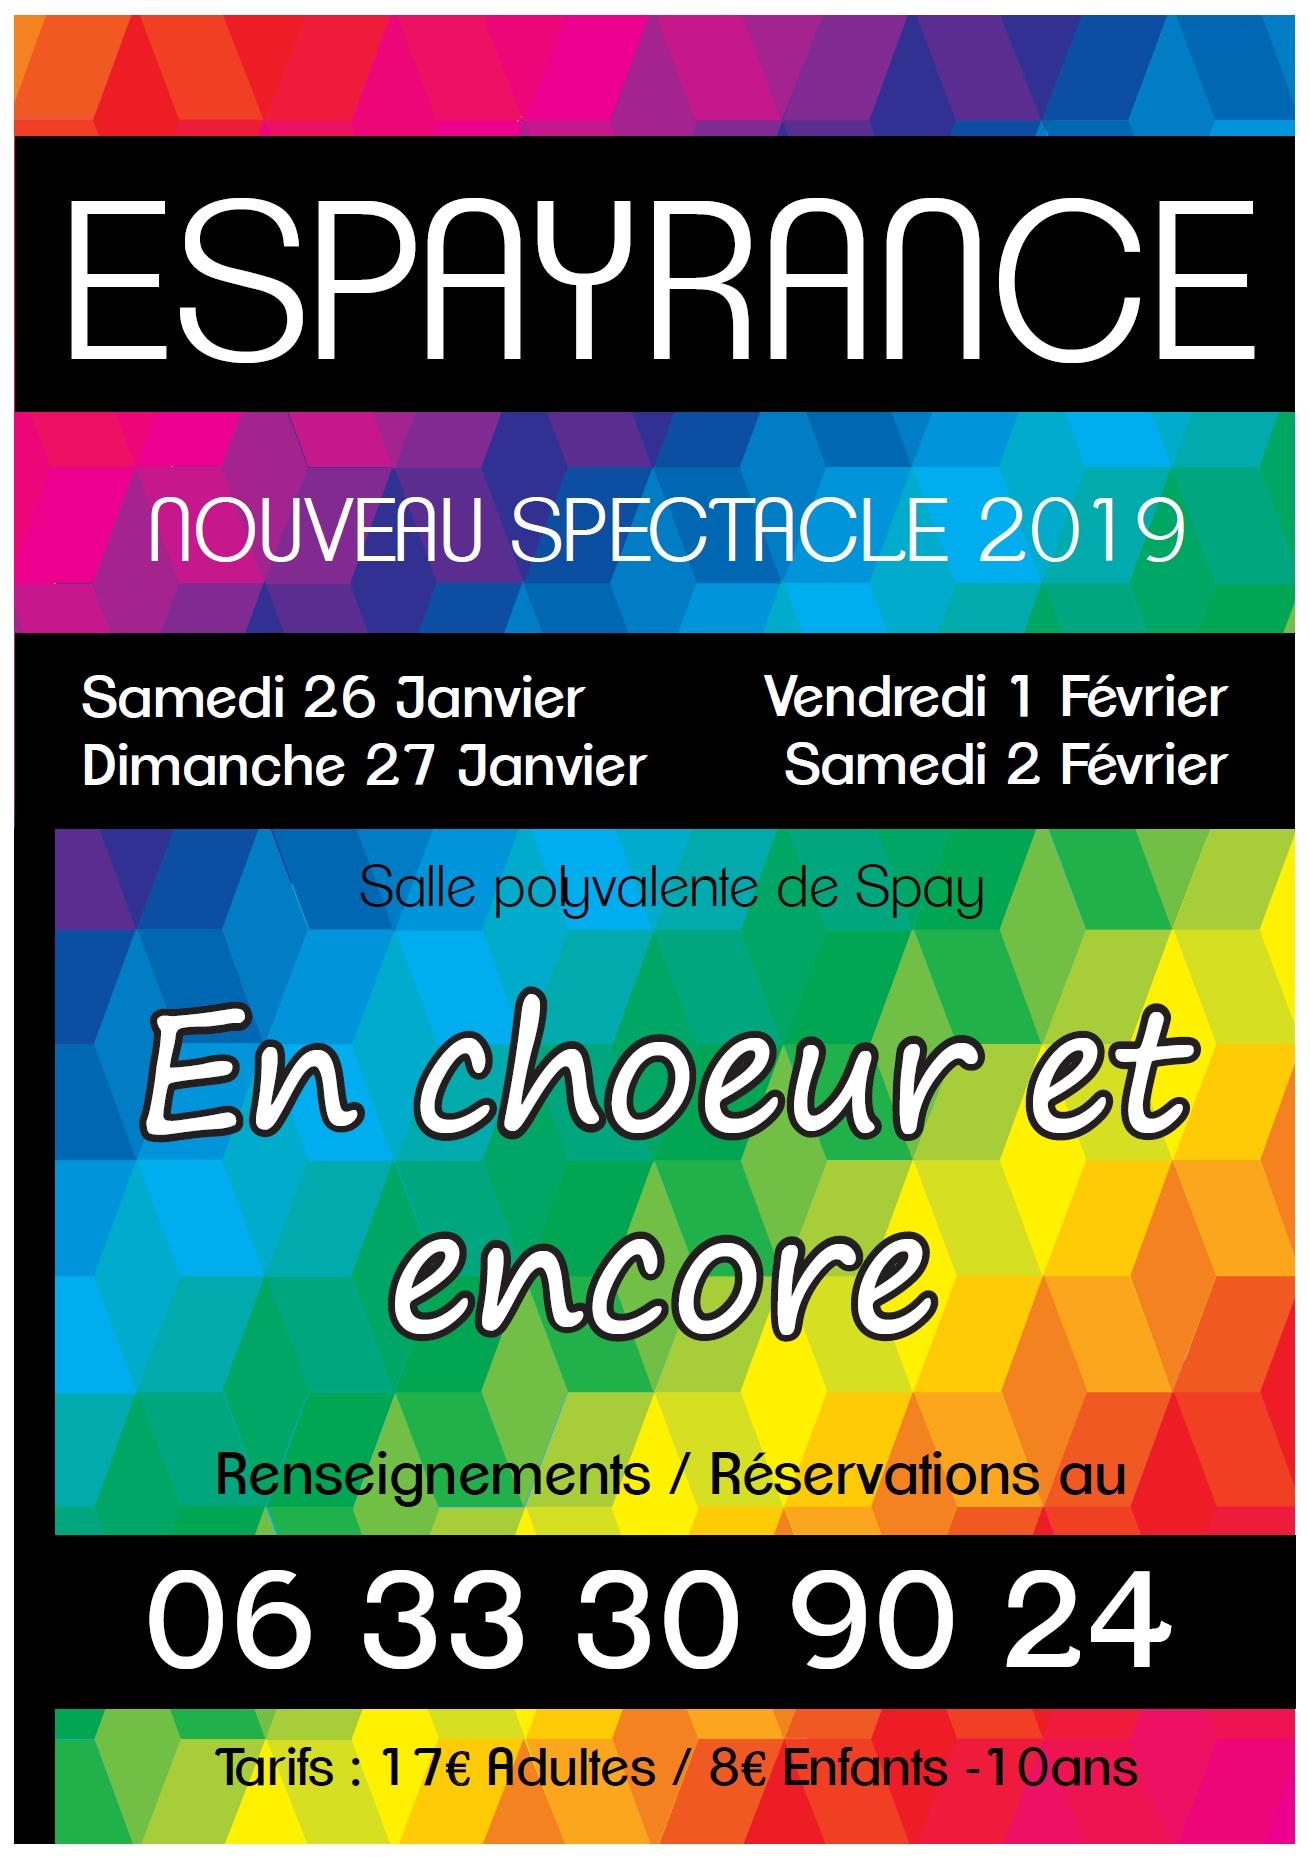 Affiche espayrance 2019 validee